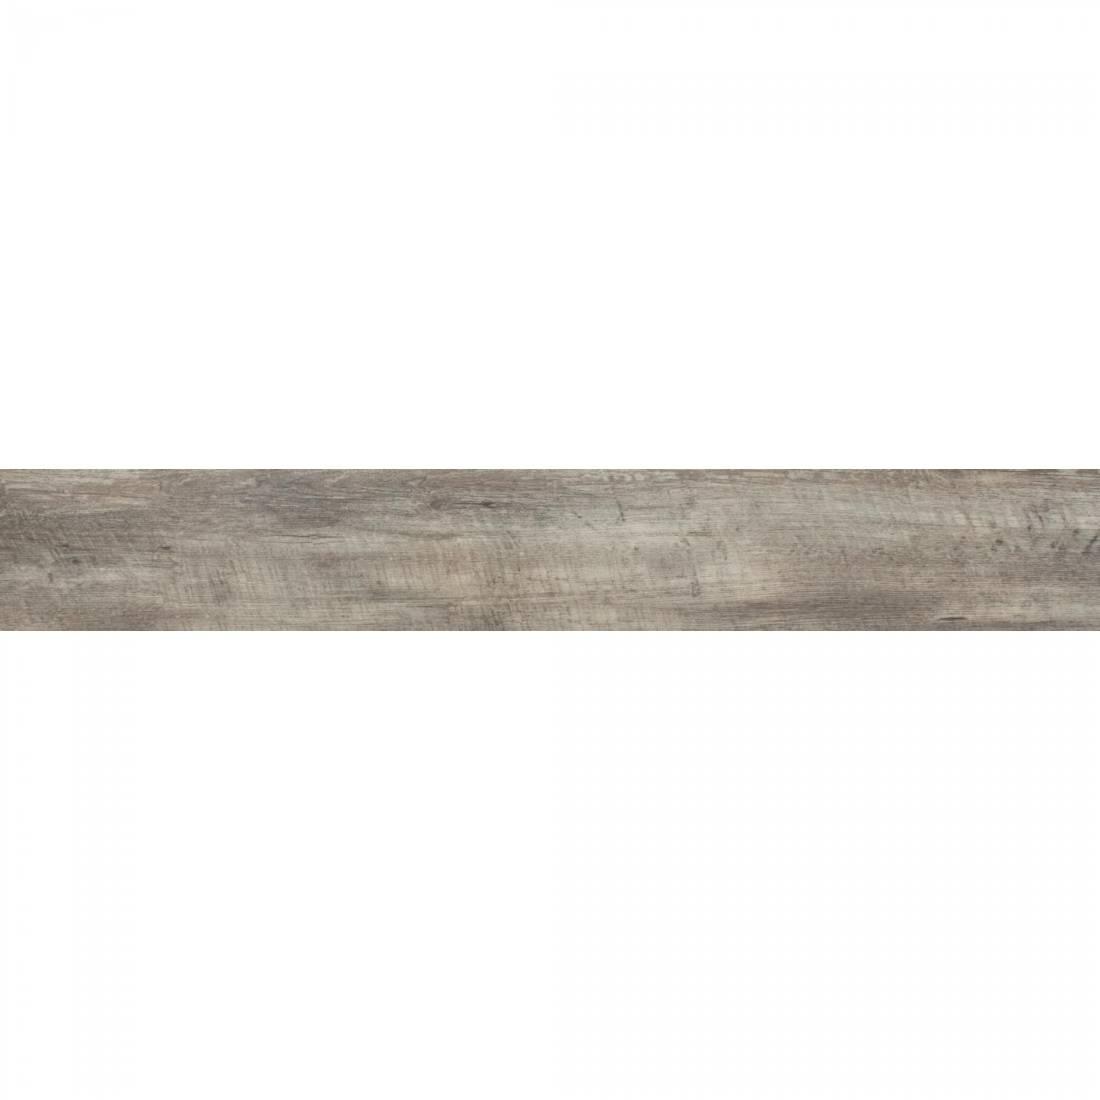 Long 20x120 LPT2002 Silver Gloss 1